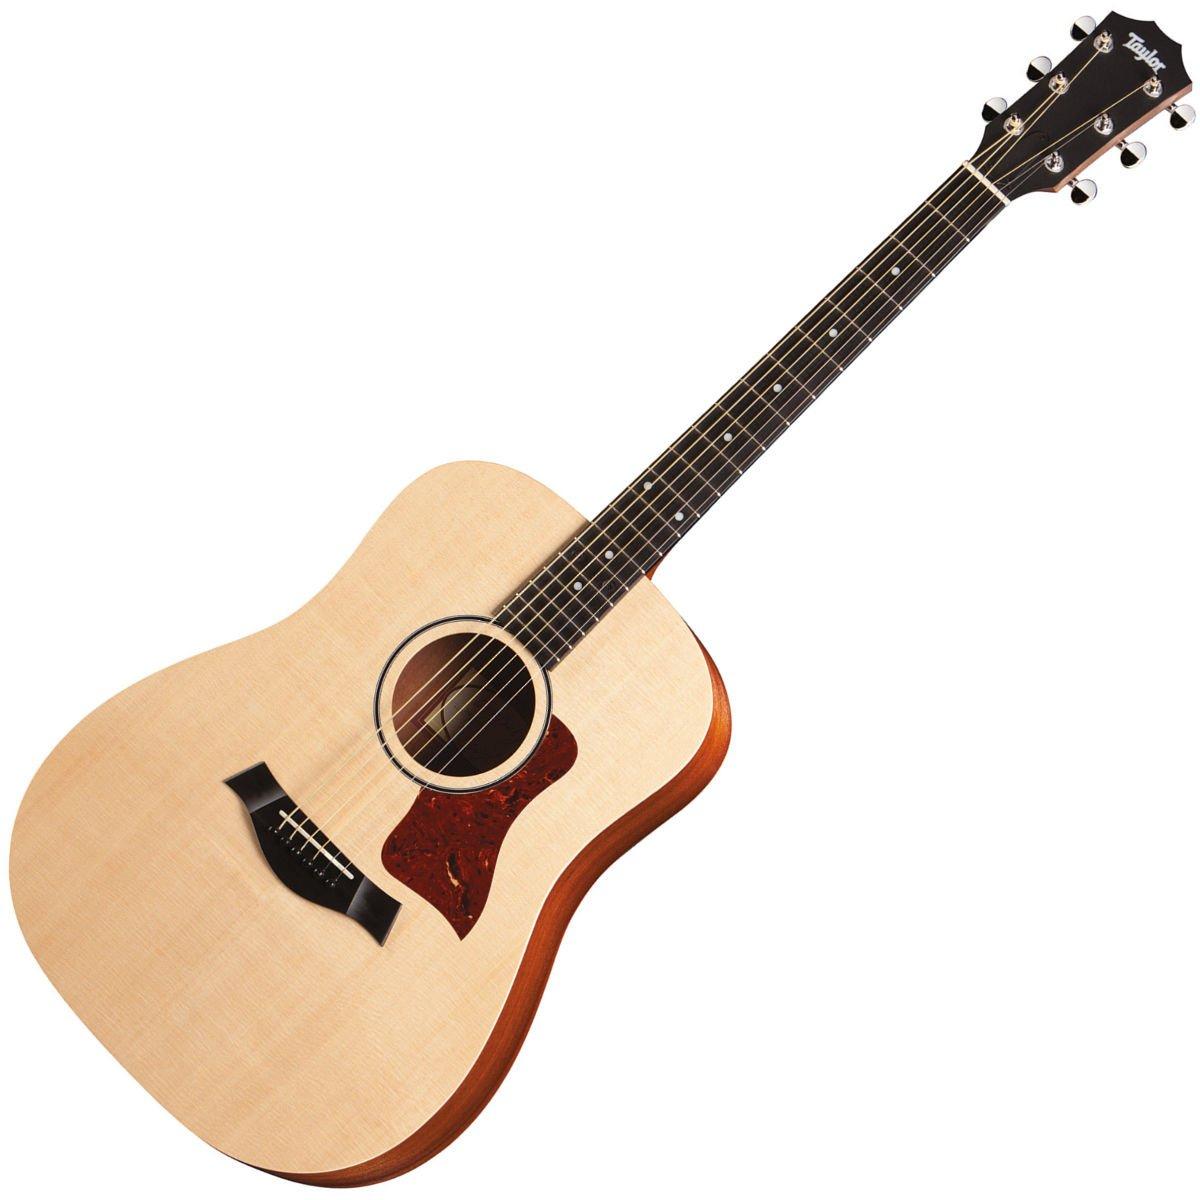 Taylor Bbt Big Baby Acoustic Guitar Solid Top Case